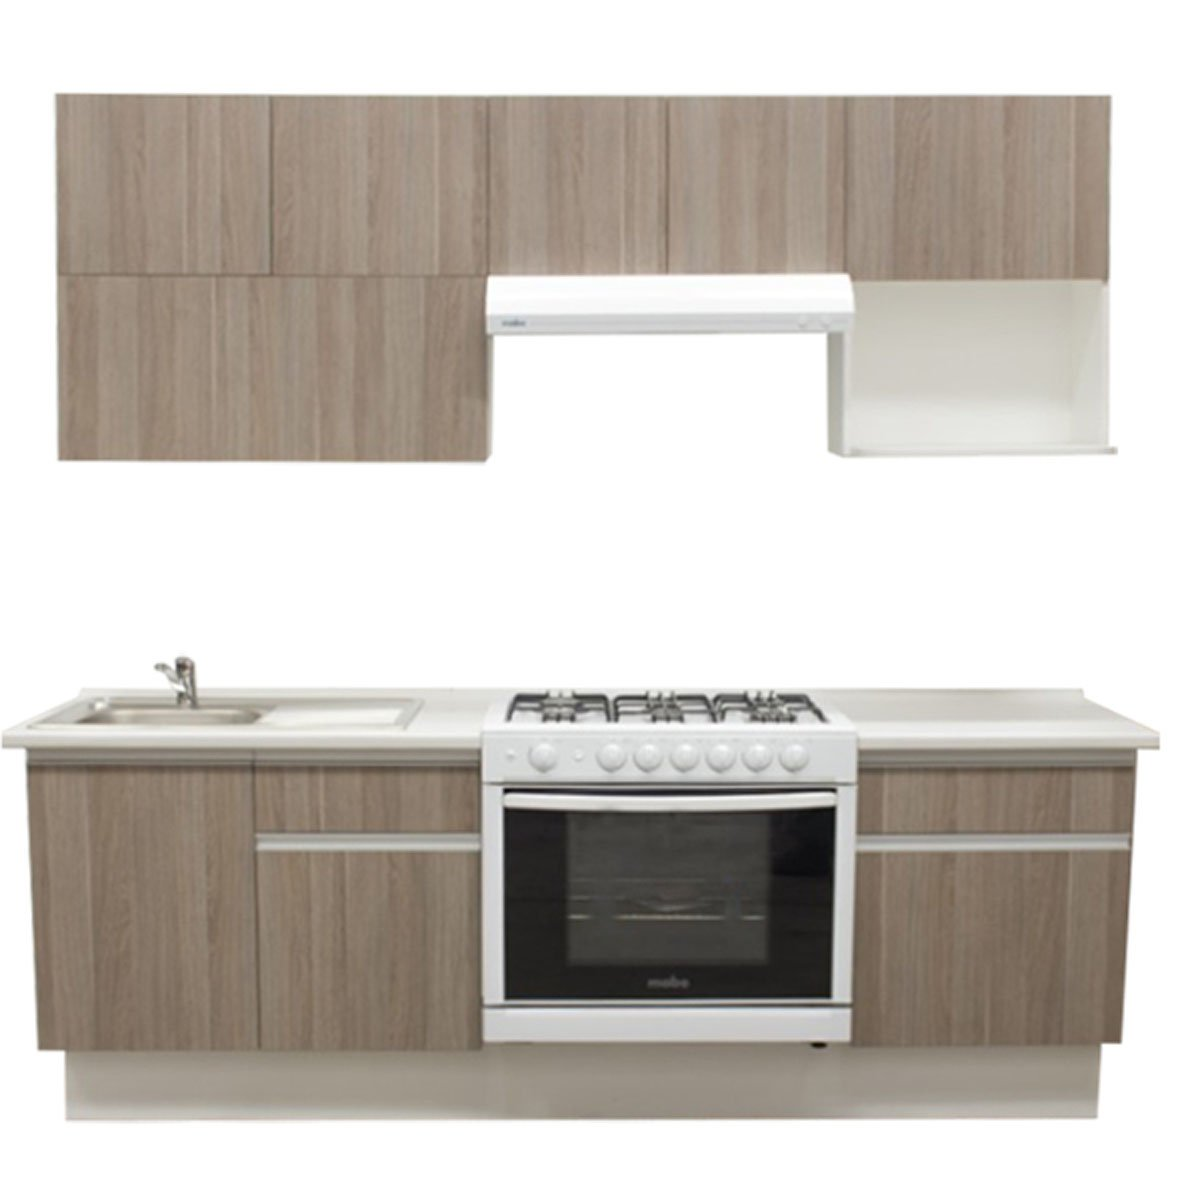 Cocina integral cendra estufa derecha tarja for Programa para disenar cocinas integrales en linea